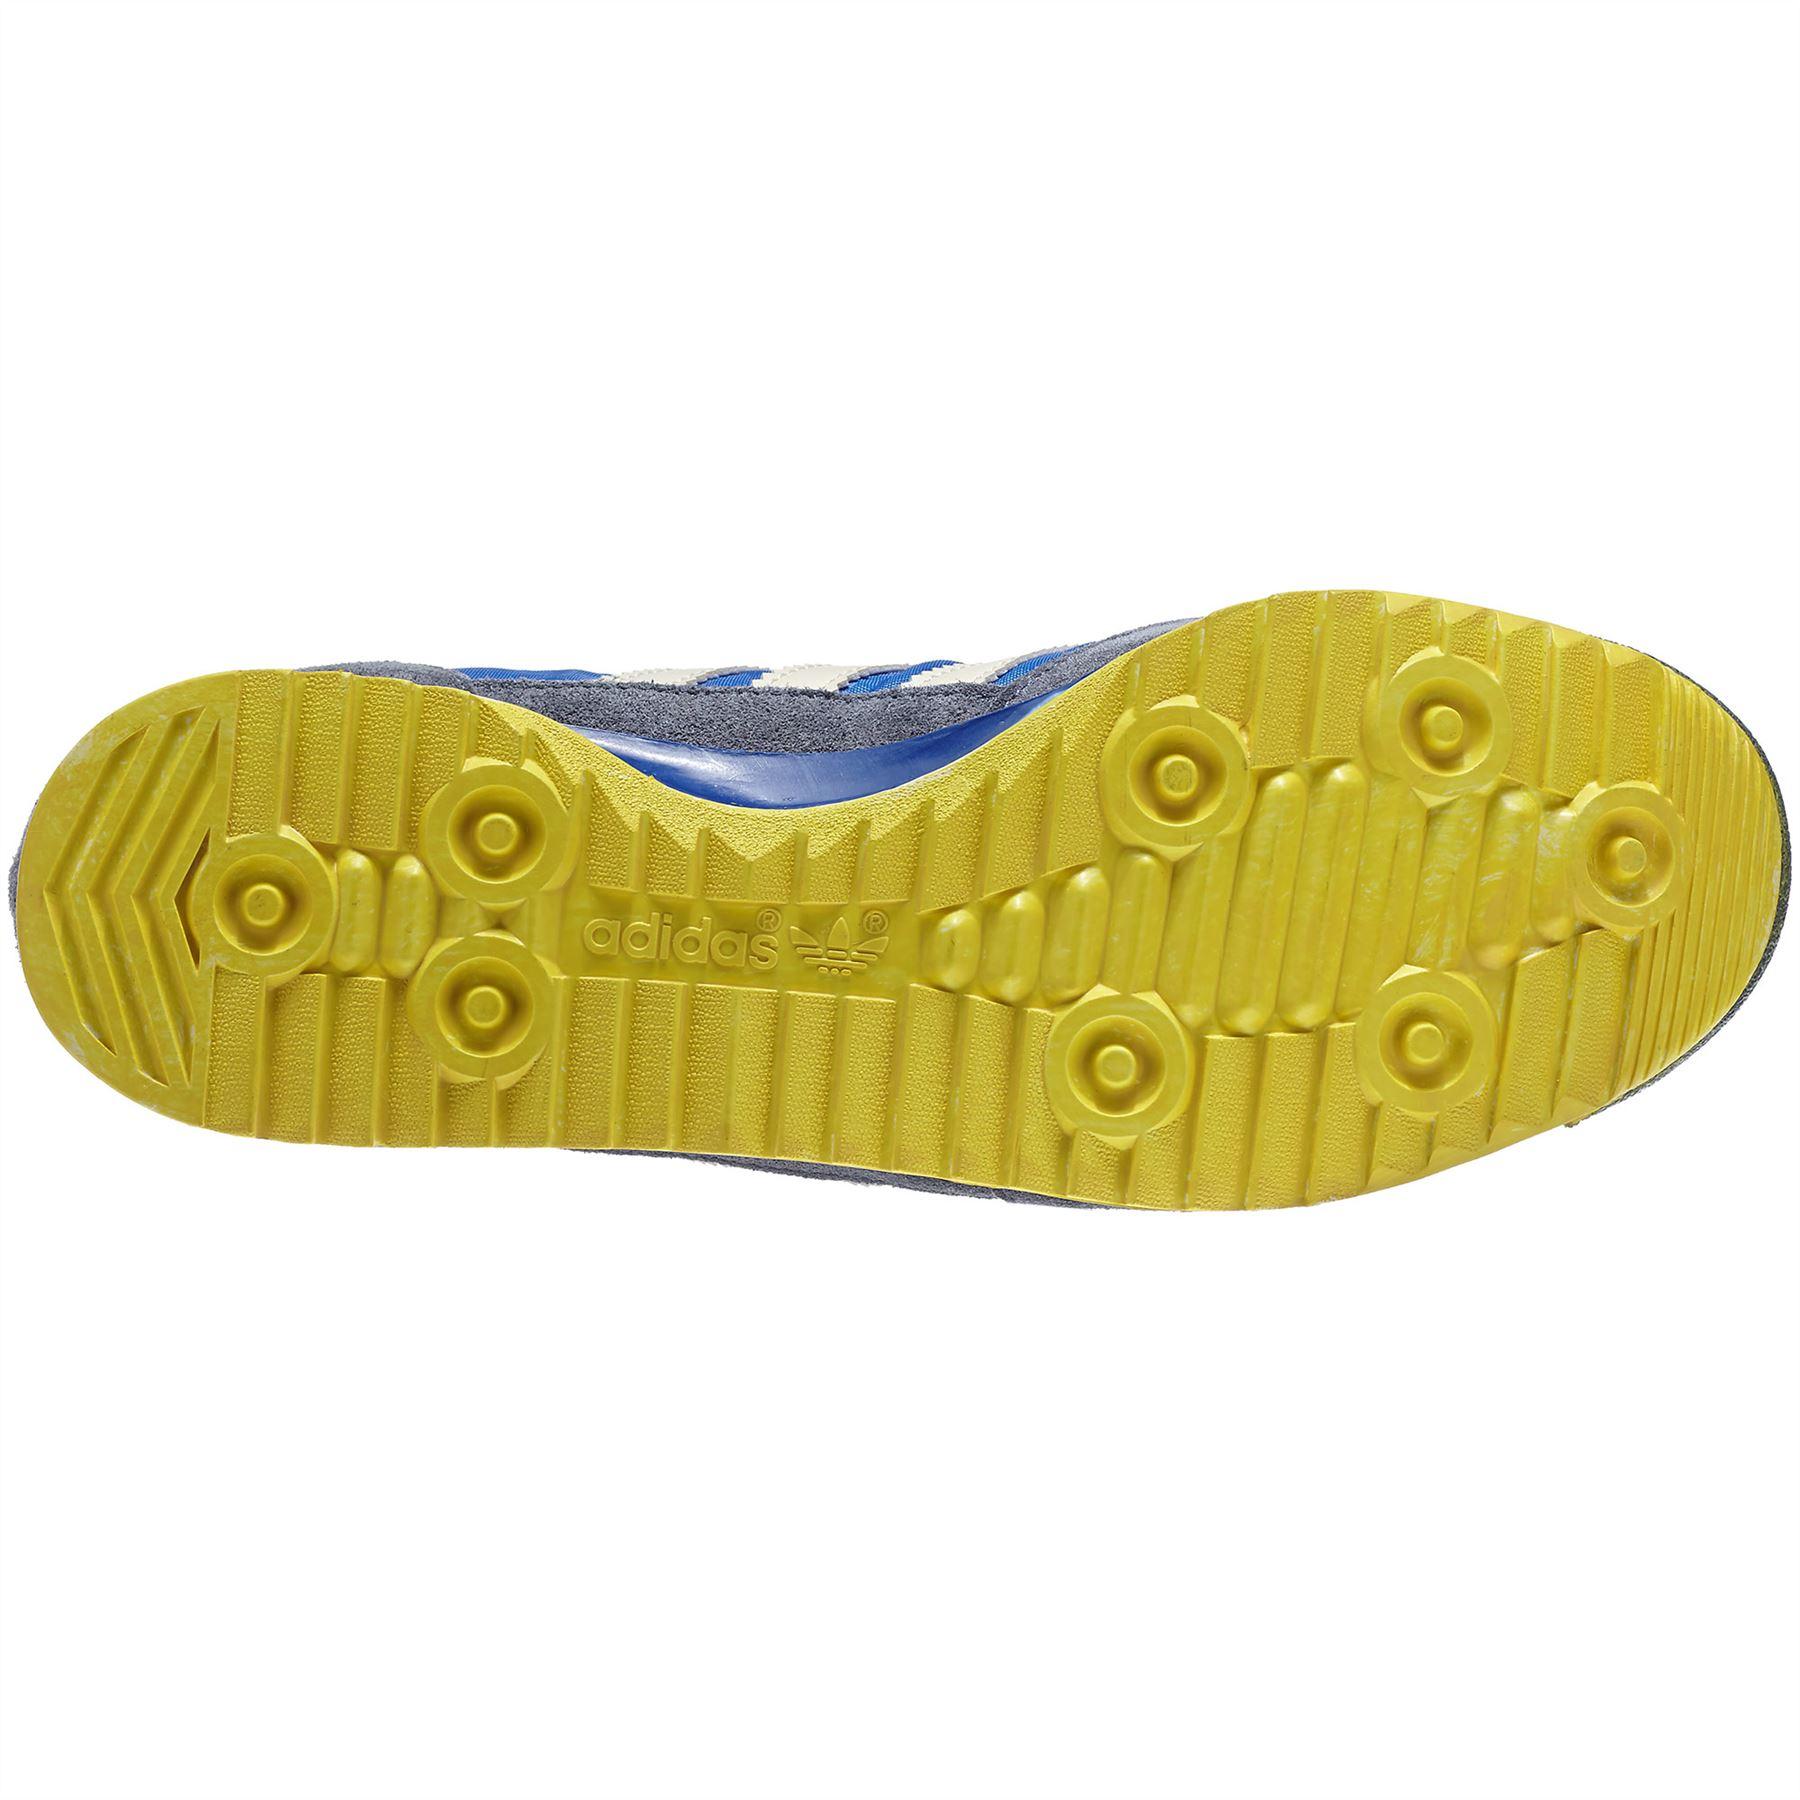 812c0ecfb3f8 adidas Originals SL 72 Vintage Trainers Mens Blue Retro Sneakers Running  Shoes